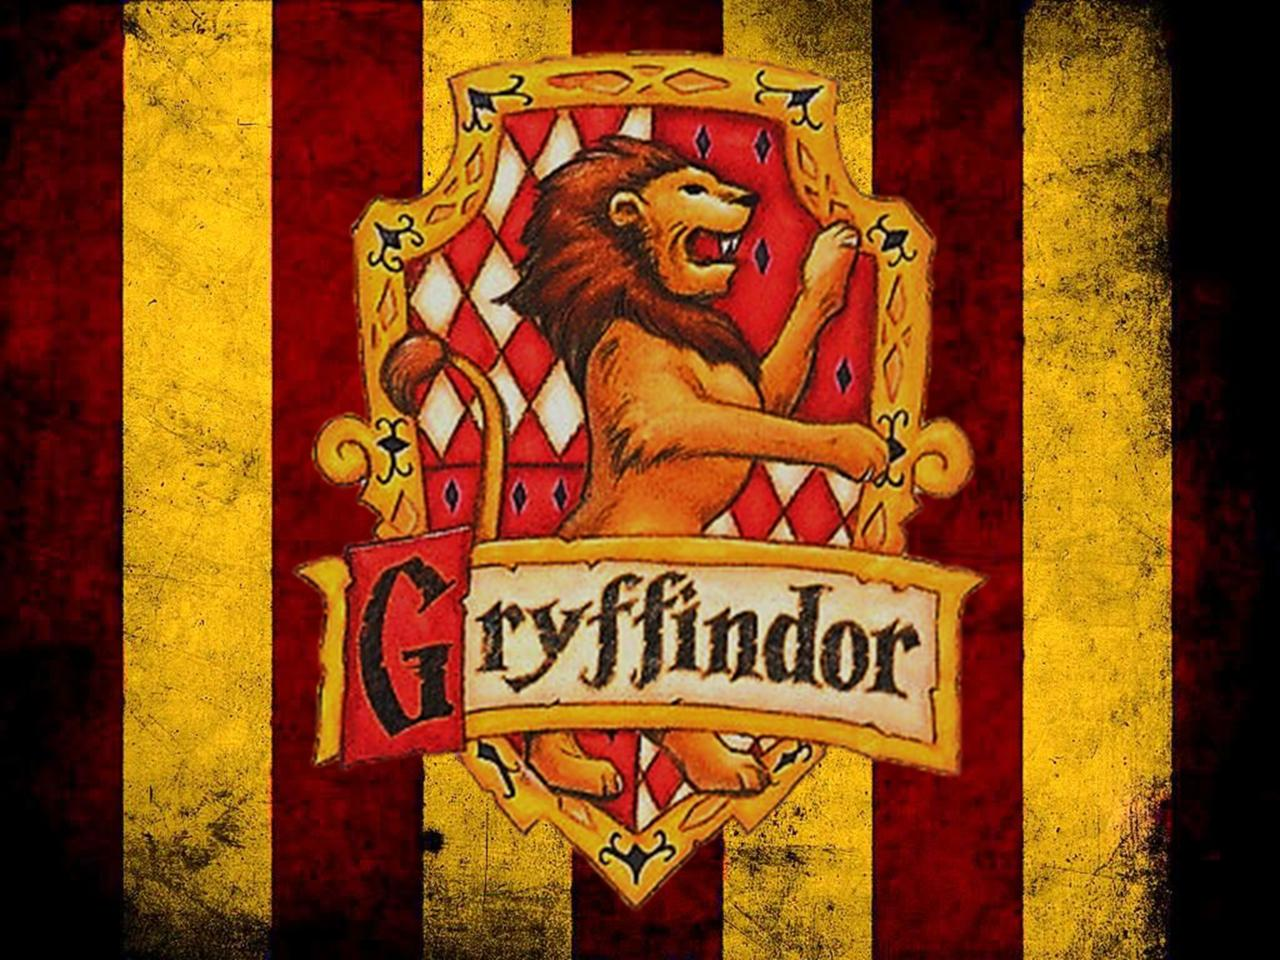 No Name] (Gryffindor)   Hogwarts is Here